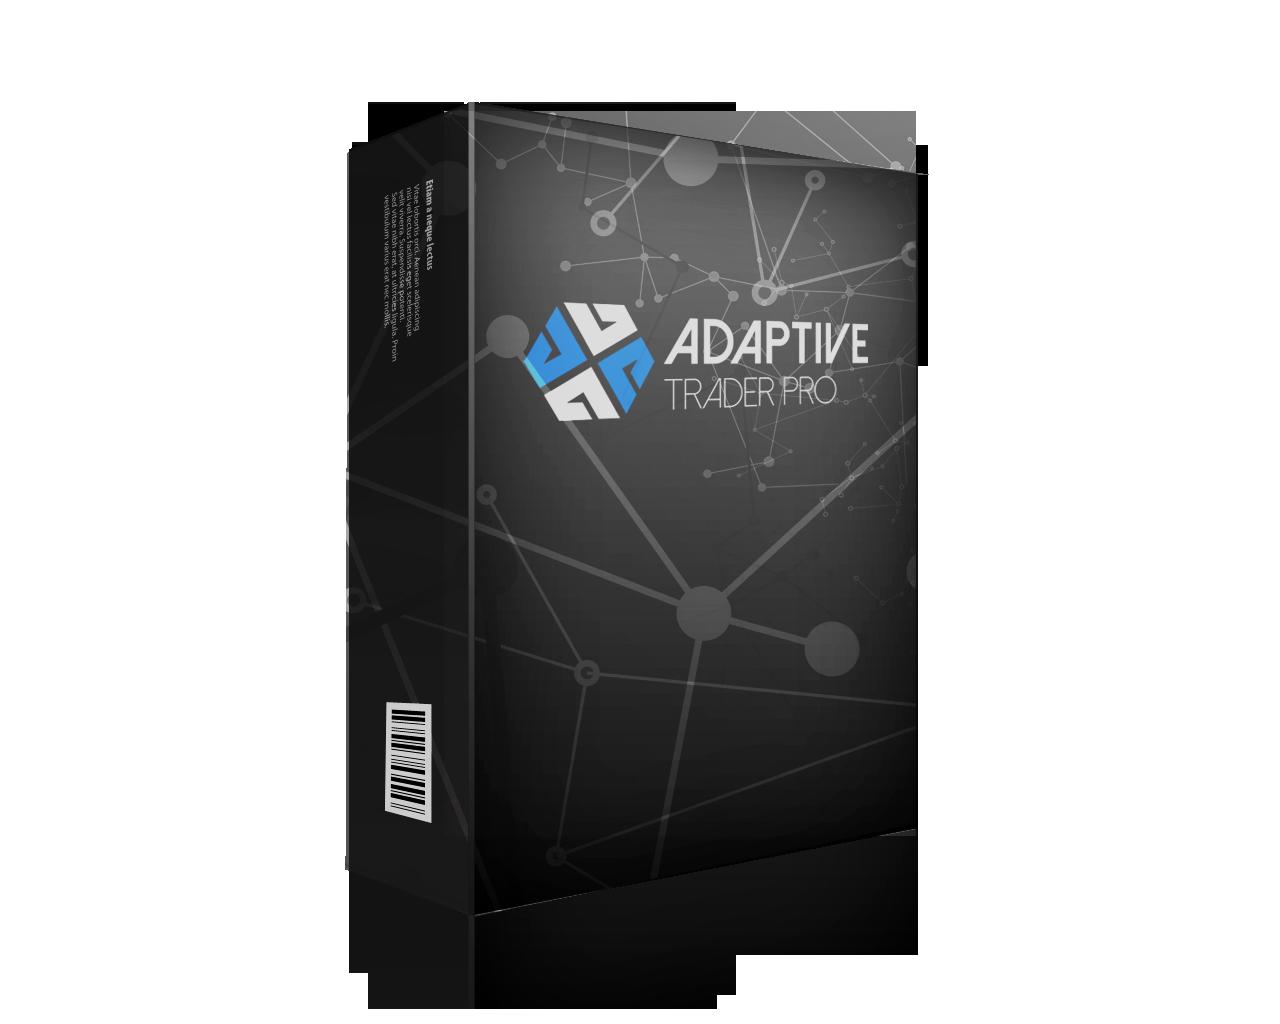 product-box-design-template-copy